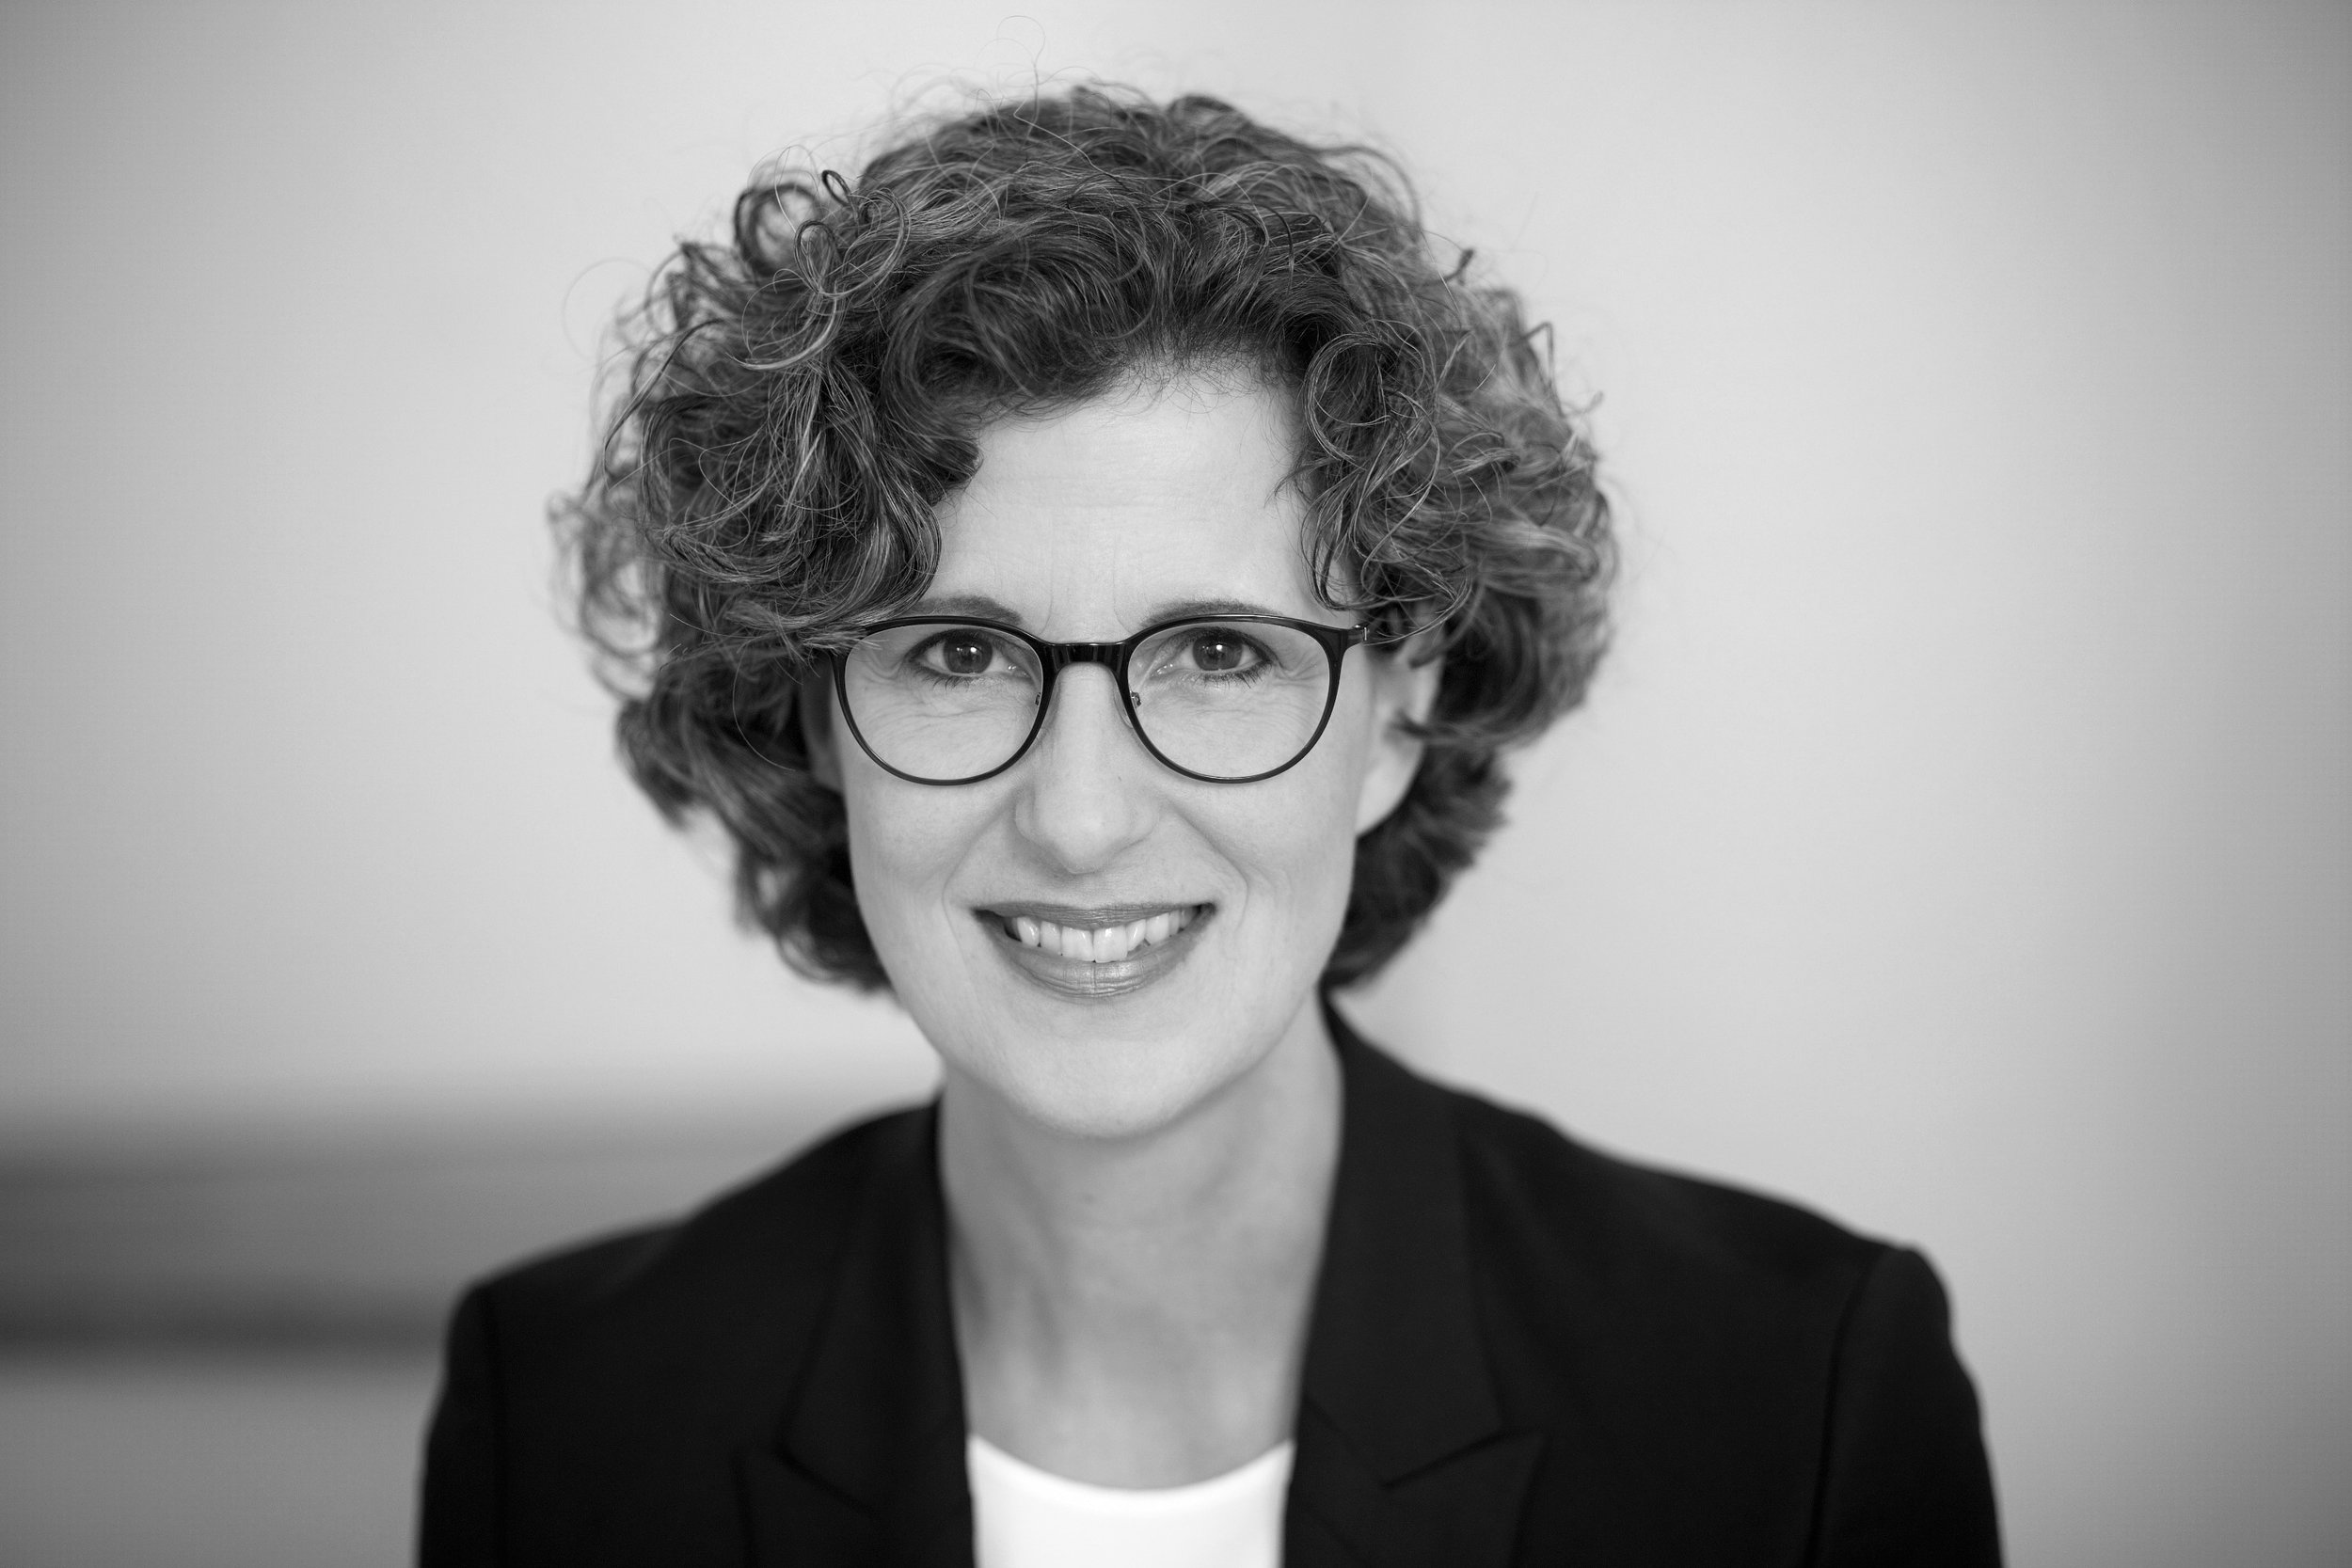 Sabine Kuesters_02 - bw.JPG